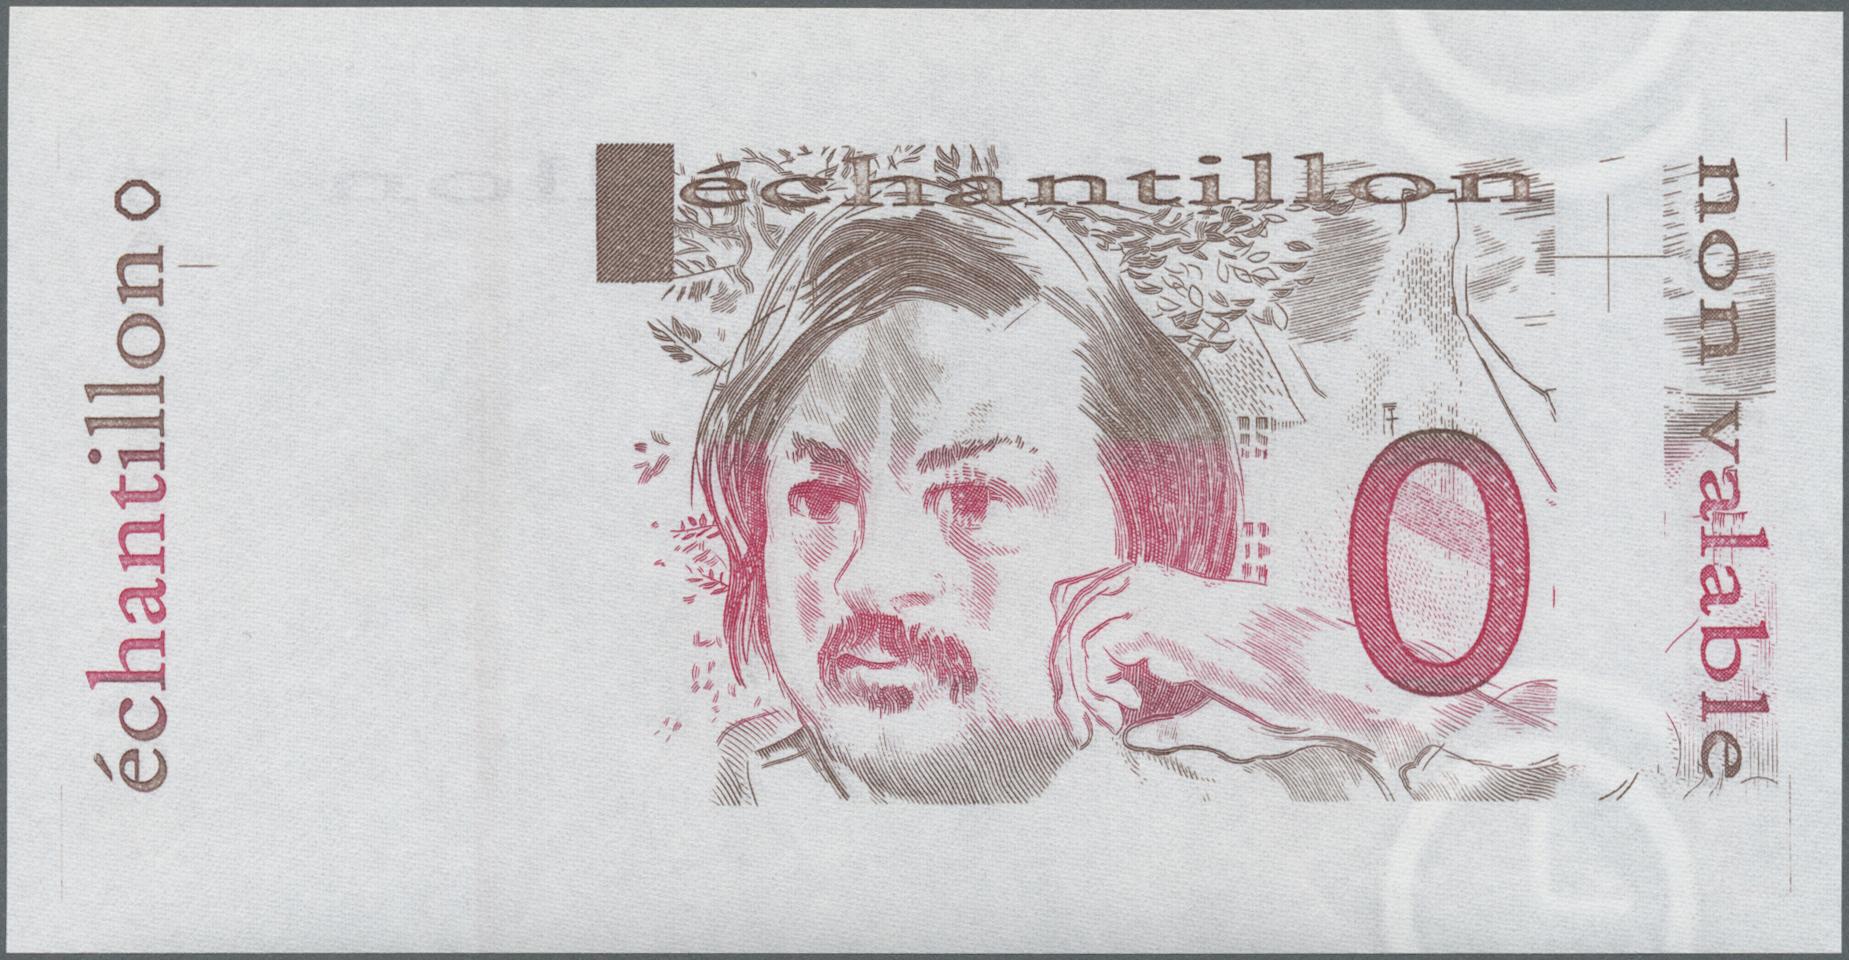 Lot 2312 - Testbanknoten | Banknoten  -  Auktionshaus Christoph Gärtner GmbH & Co. KG Banknotes & Coins Auction #39 Day 2